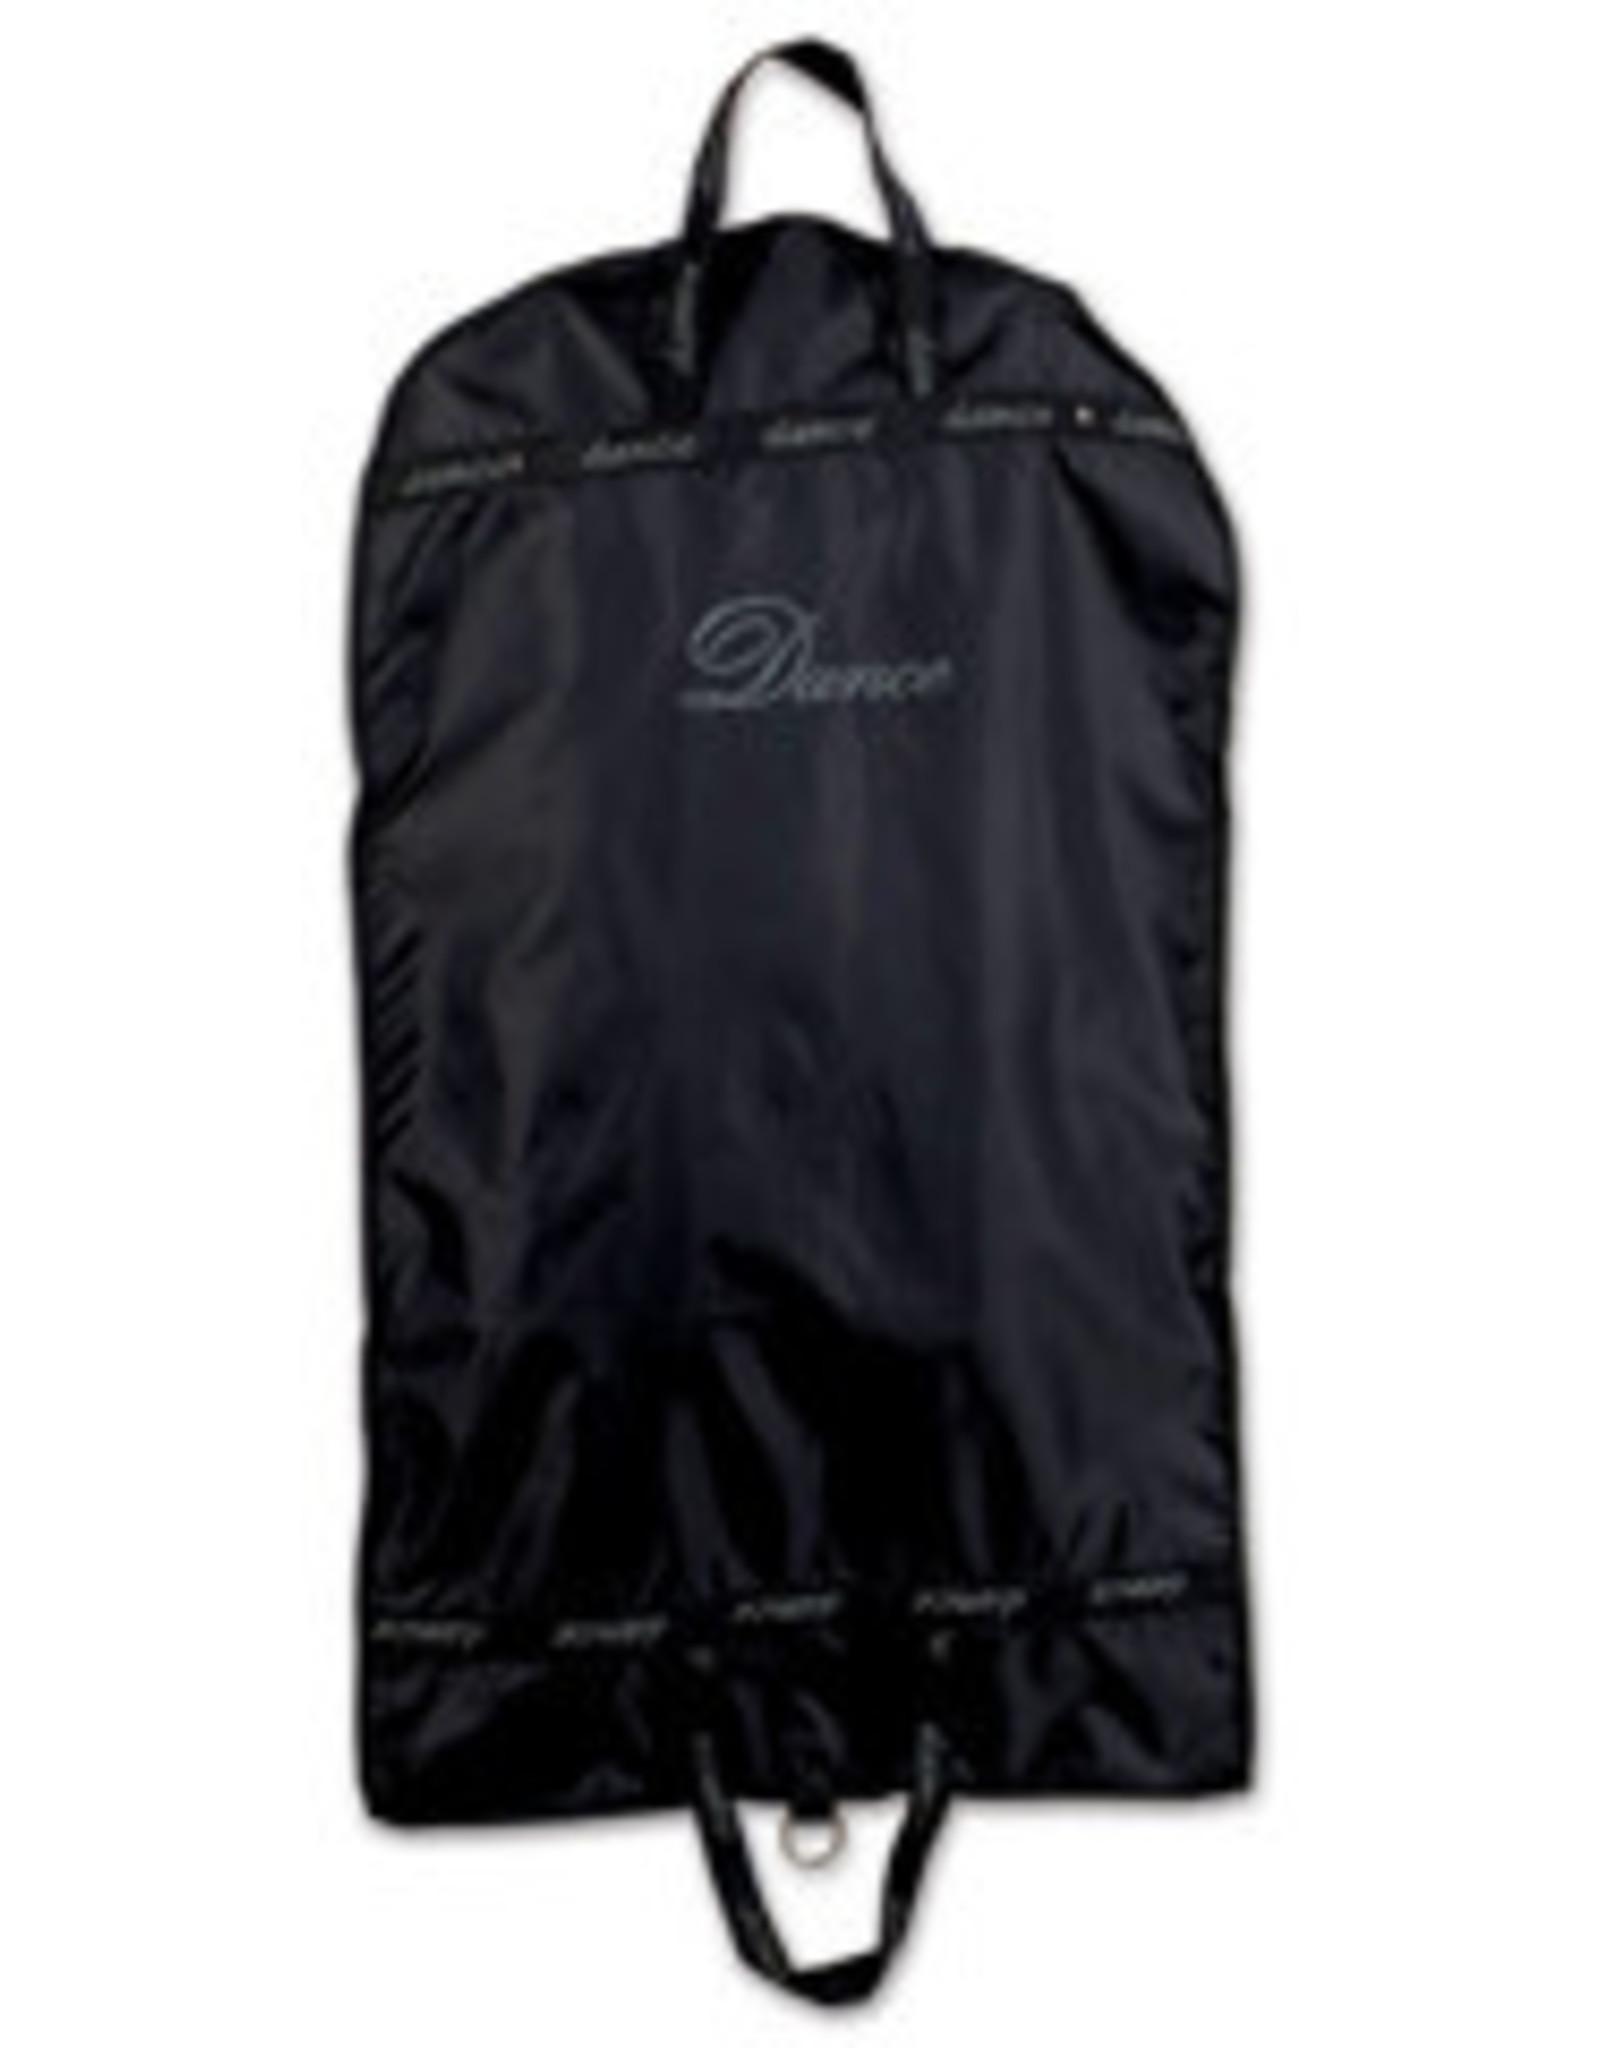 Danshuz B905 GARMENT BAG BLK